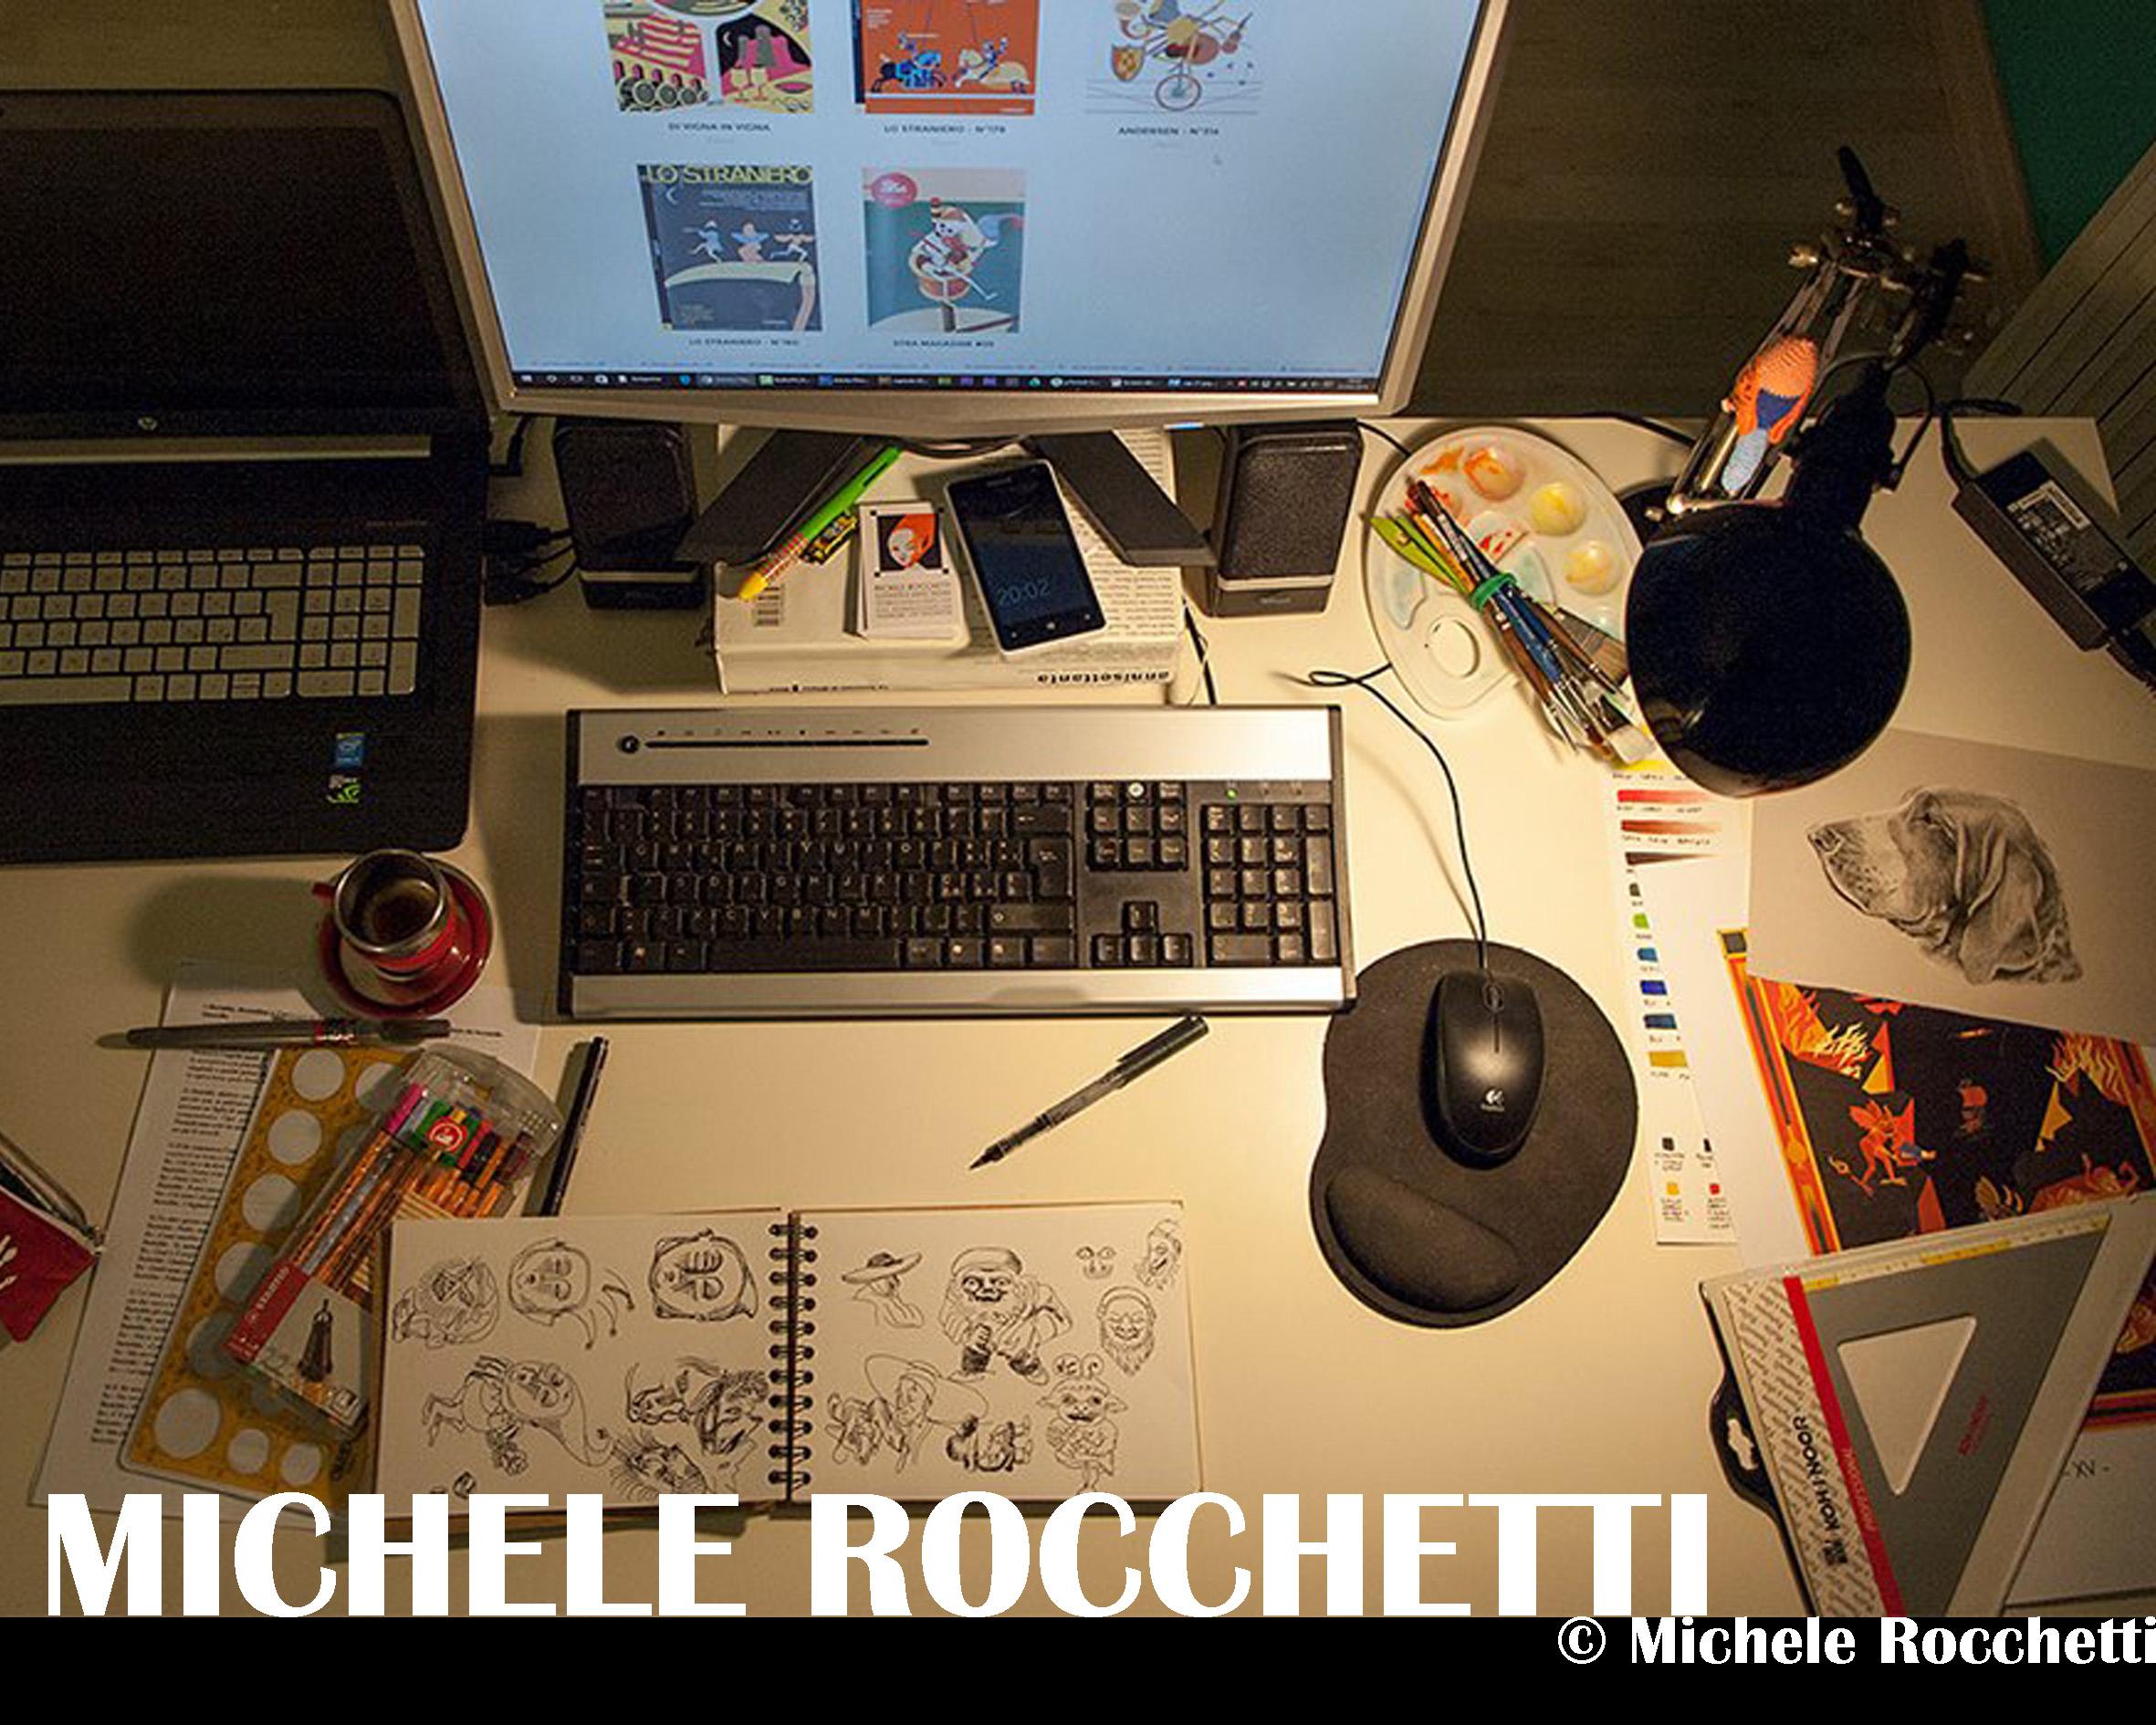 Michele Rocchetti